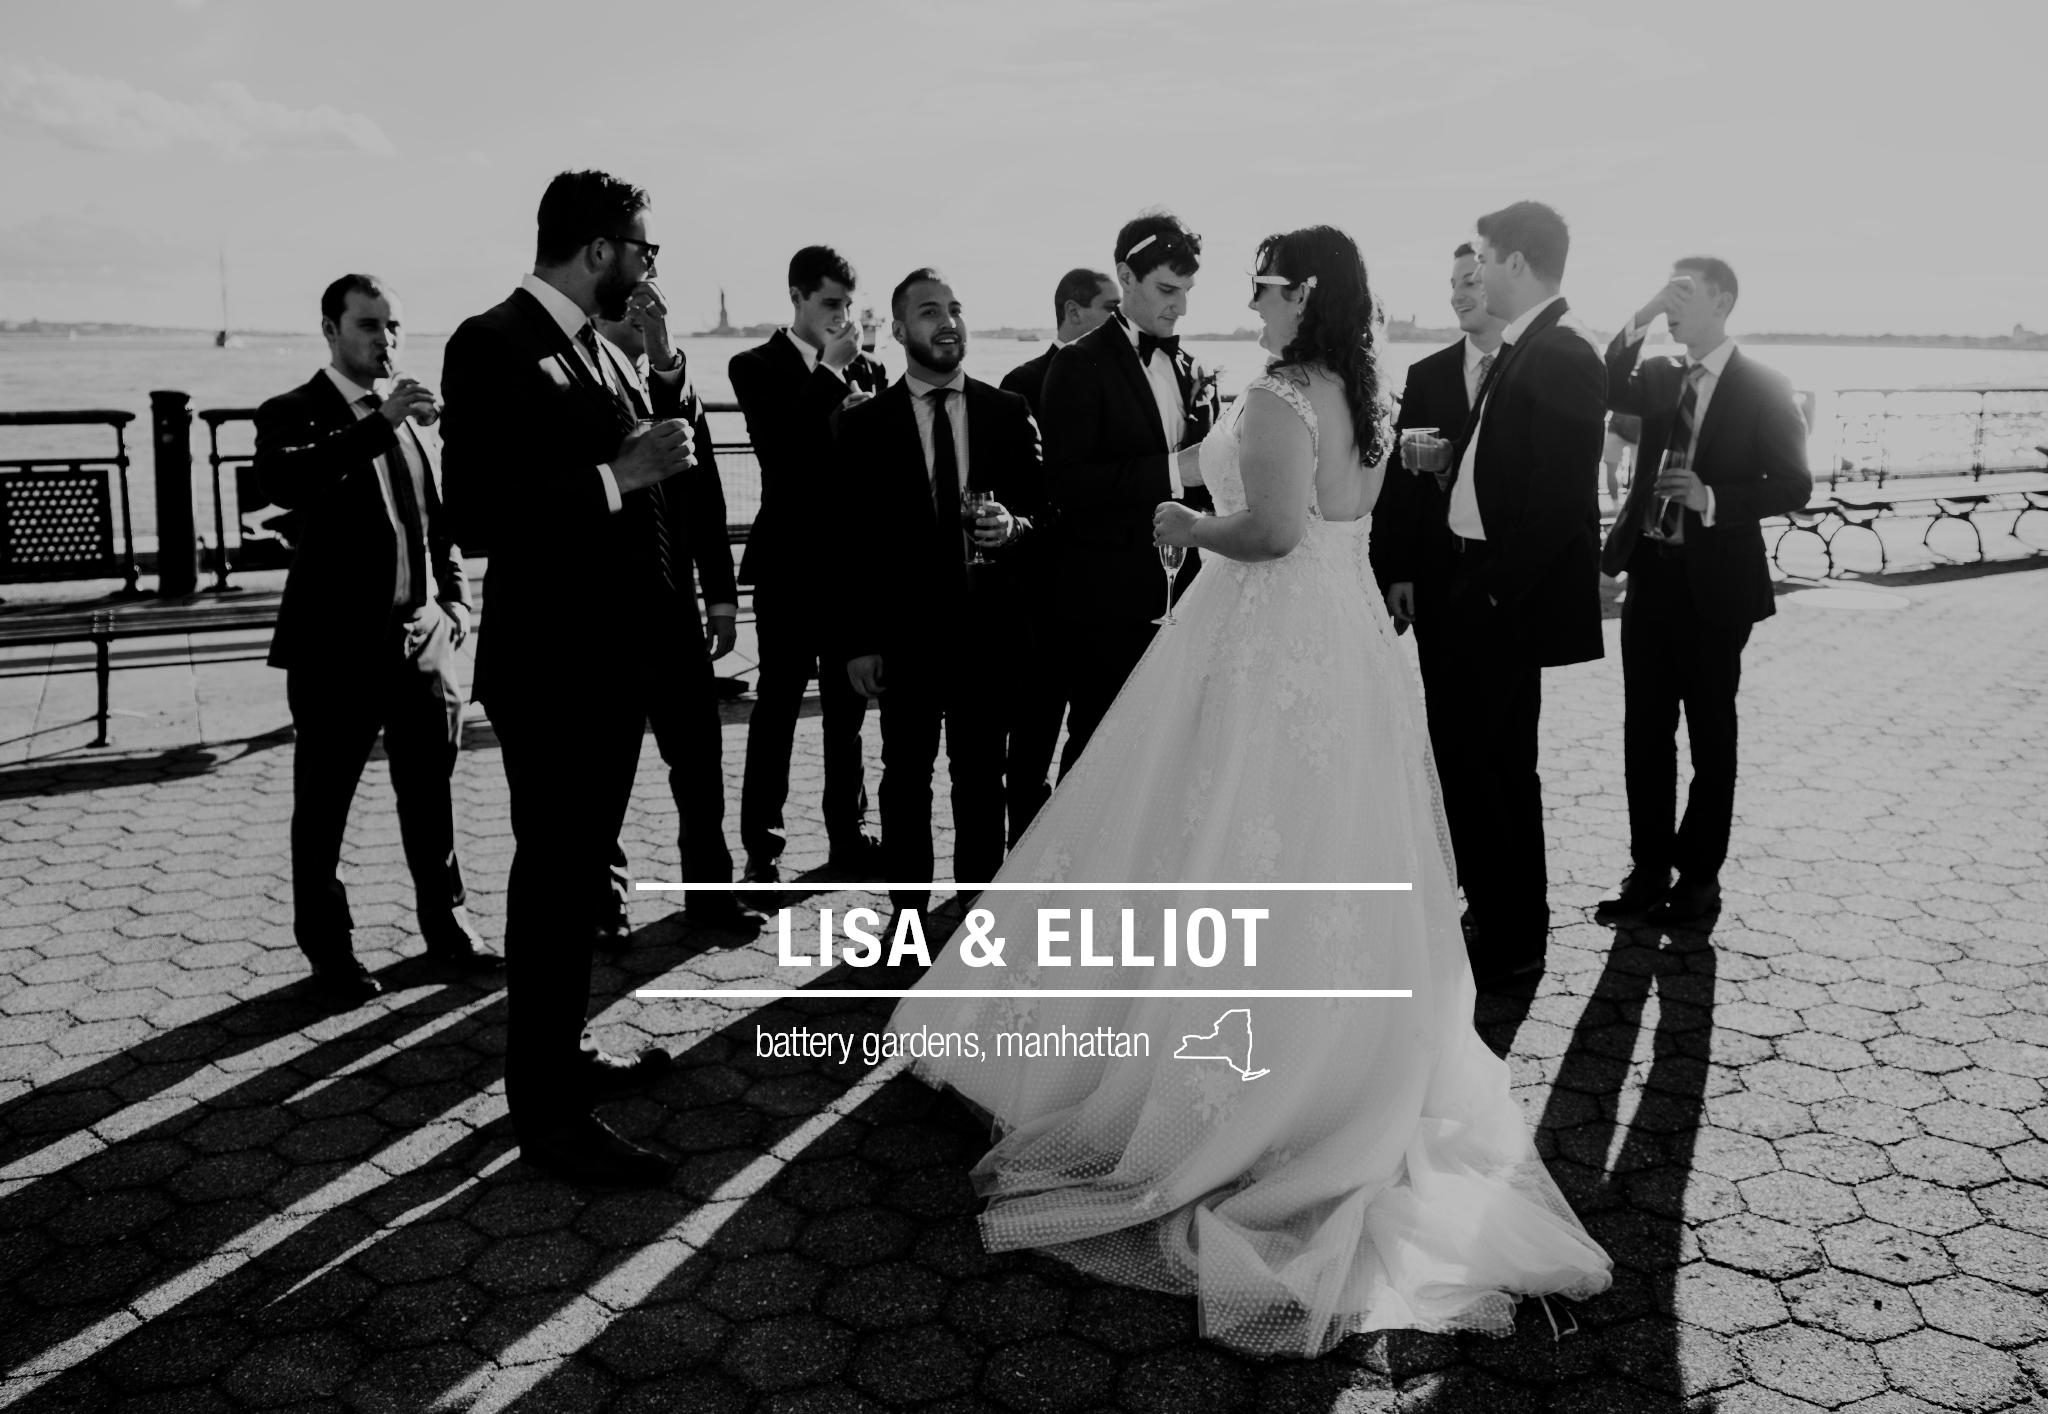 NYC WEDDING .jpg